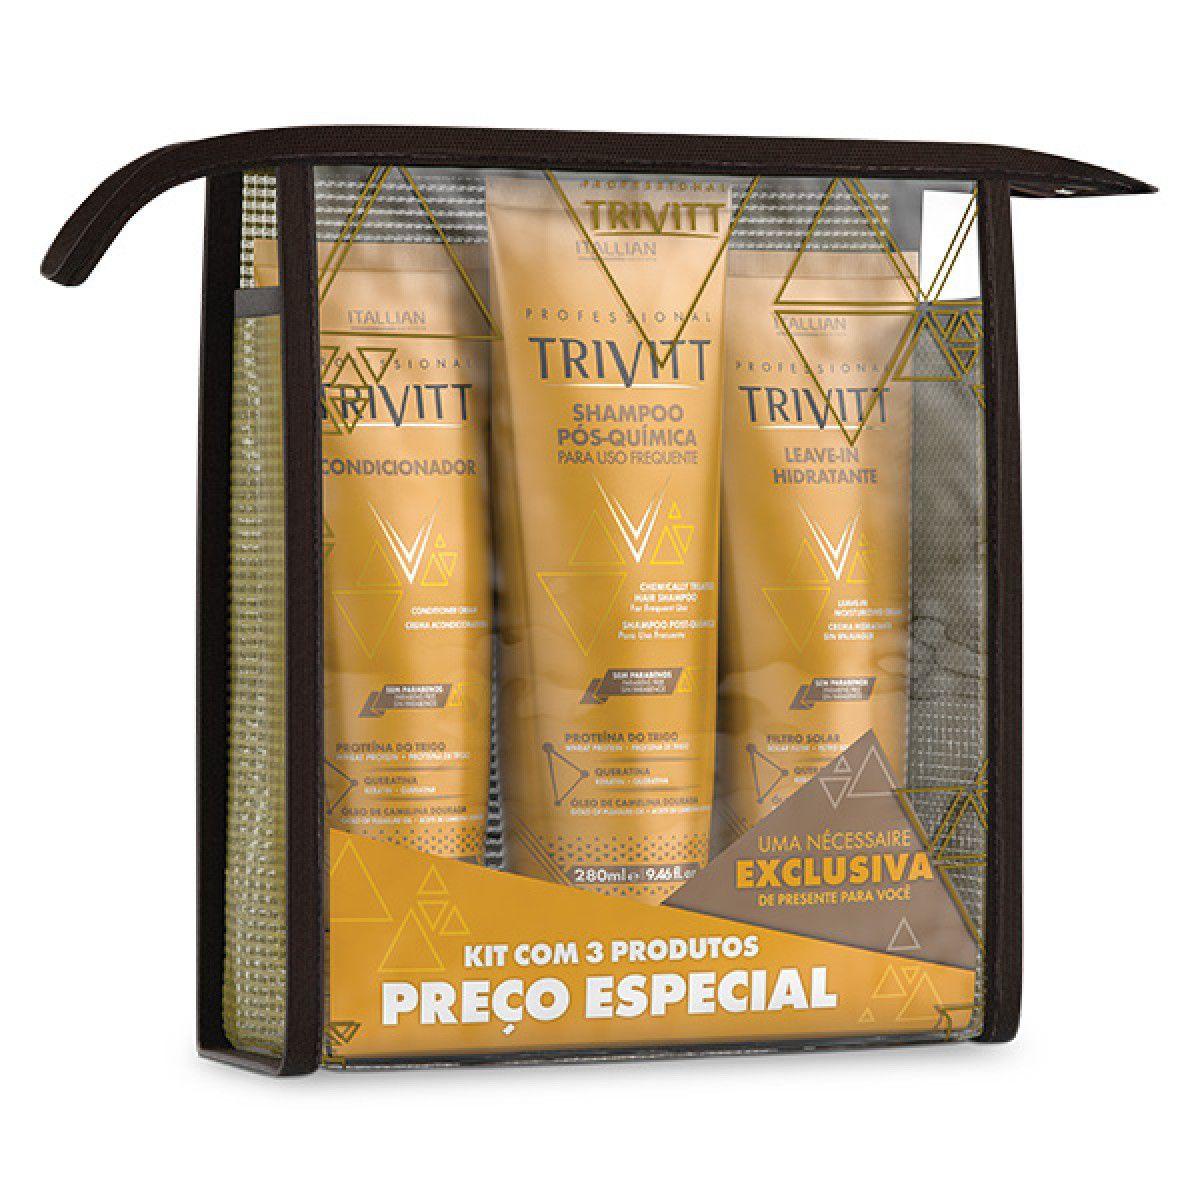 Kit Home Care Manutenção Trivitt Com Leave-in Hidratante